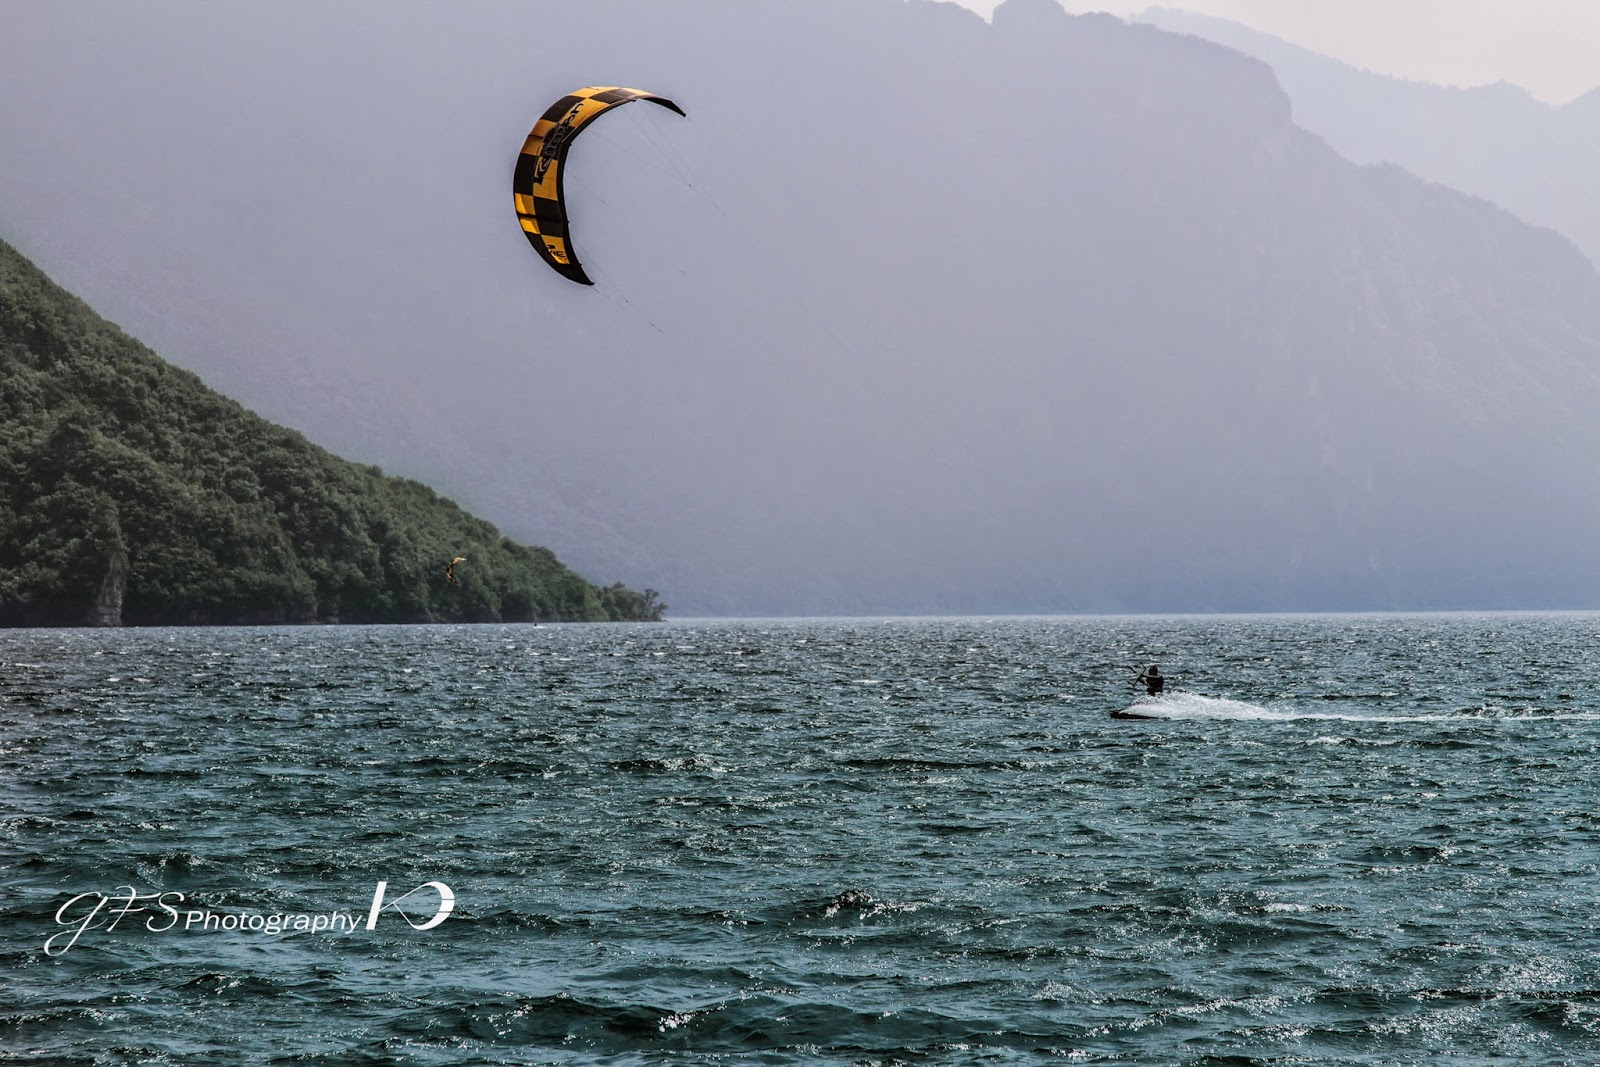 kitesurf, kiteboard, lake, Como, italy, kitesurf lake Como italy